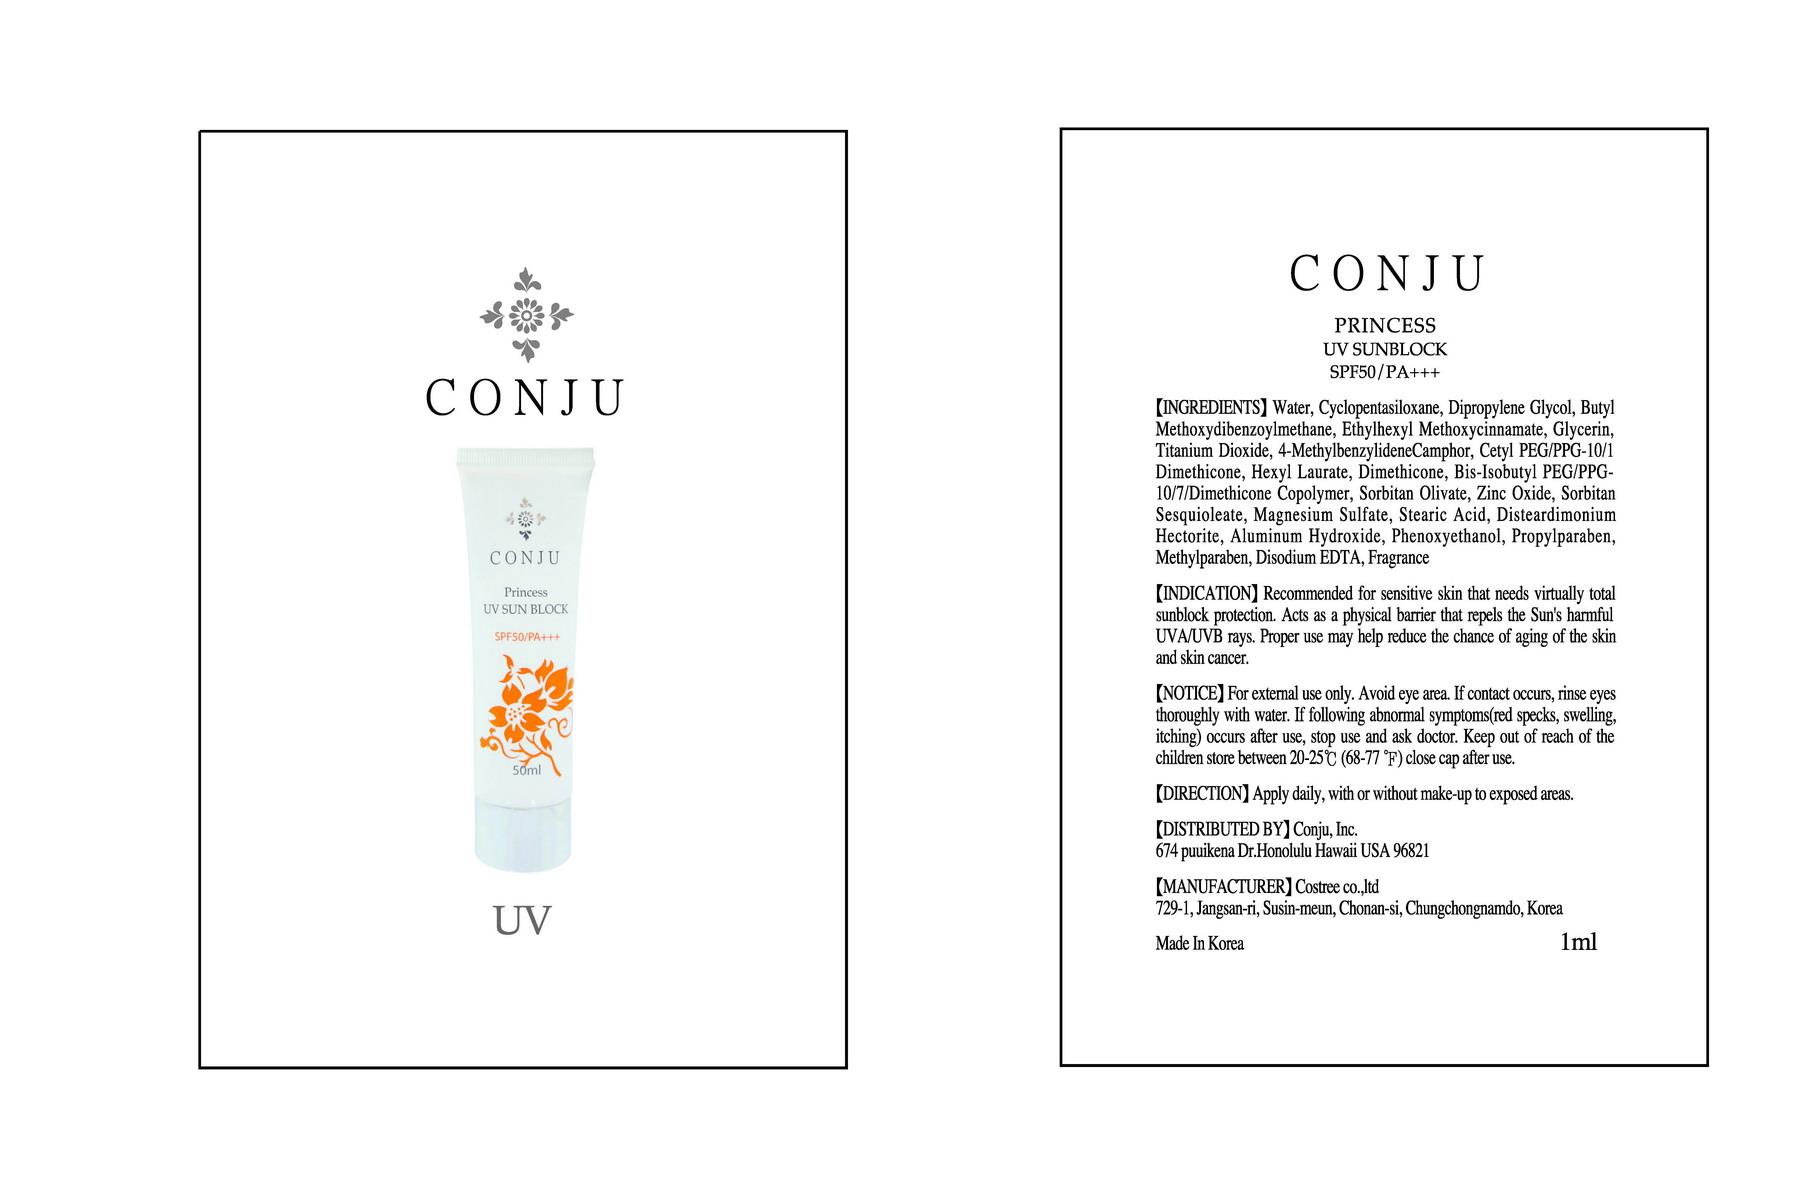 Conju Princess Uv Sun Block (Ethylhexyl Methoxycinnamate) Cream [Conju Inc]